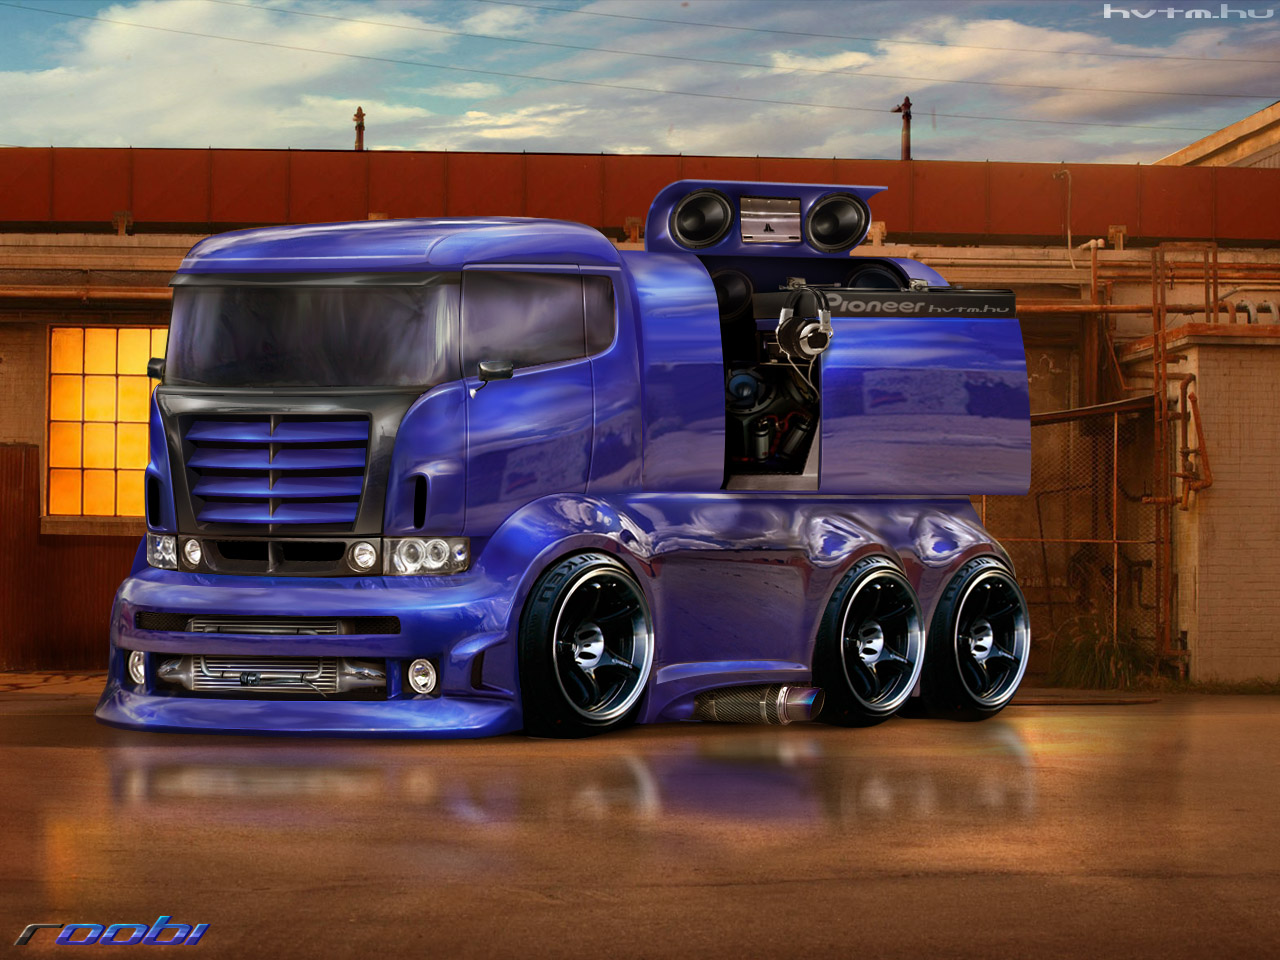 http://2.bp.blogspot.com/-UcwilDeuqRo/TsfTRHWQsLI/AAAAAAAACkU/r653ZDoYeMI/s1600/Scania_R420_by_roobi.jpg